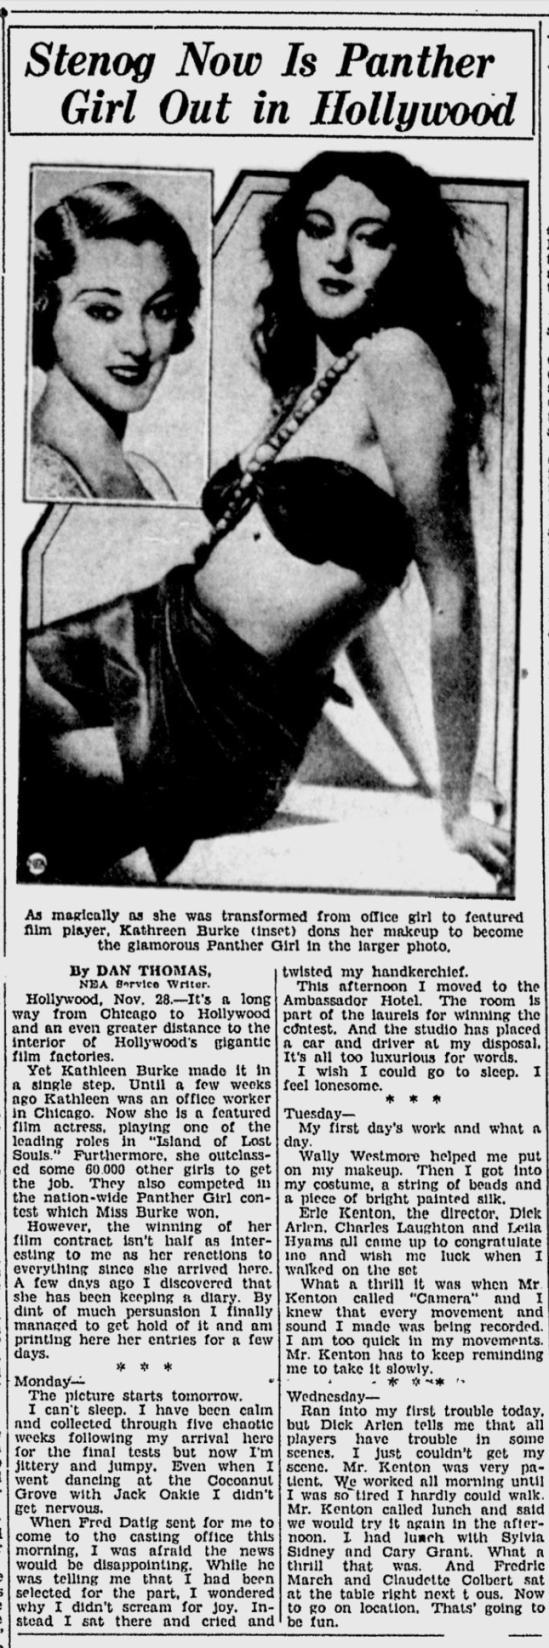 Island Of Lost Souls, Spartanburg Herald, November 29, 1932